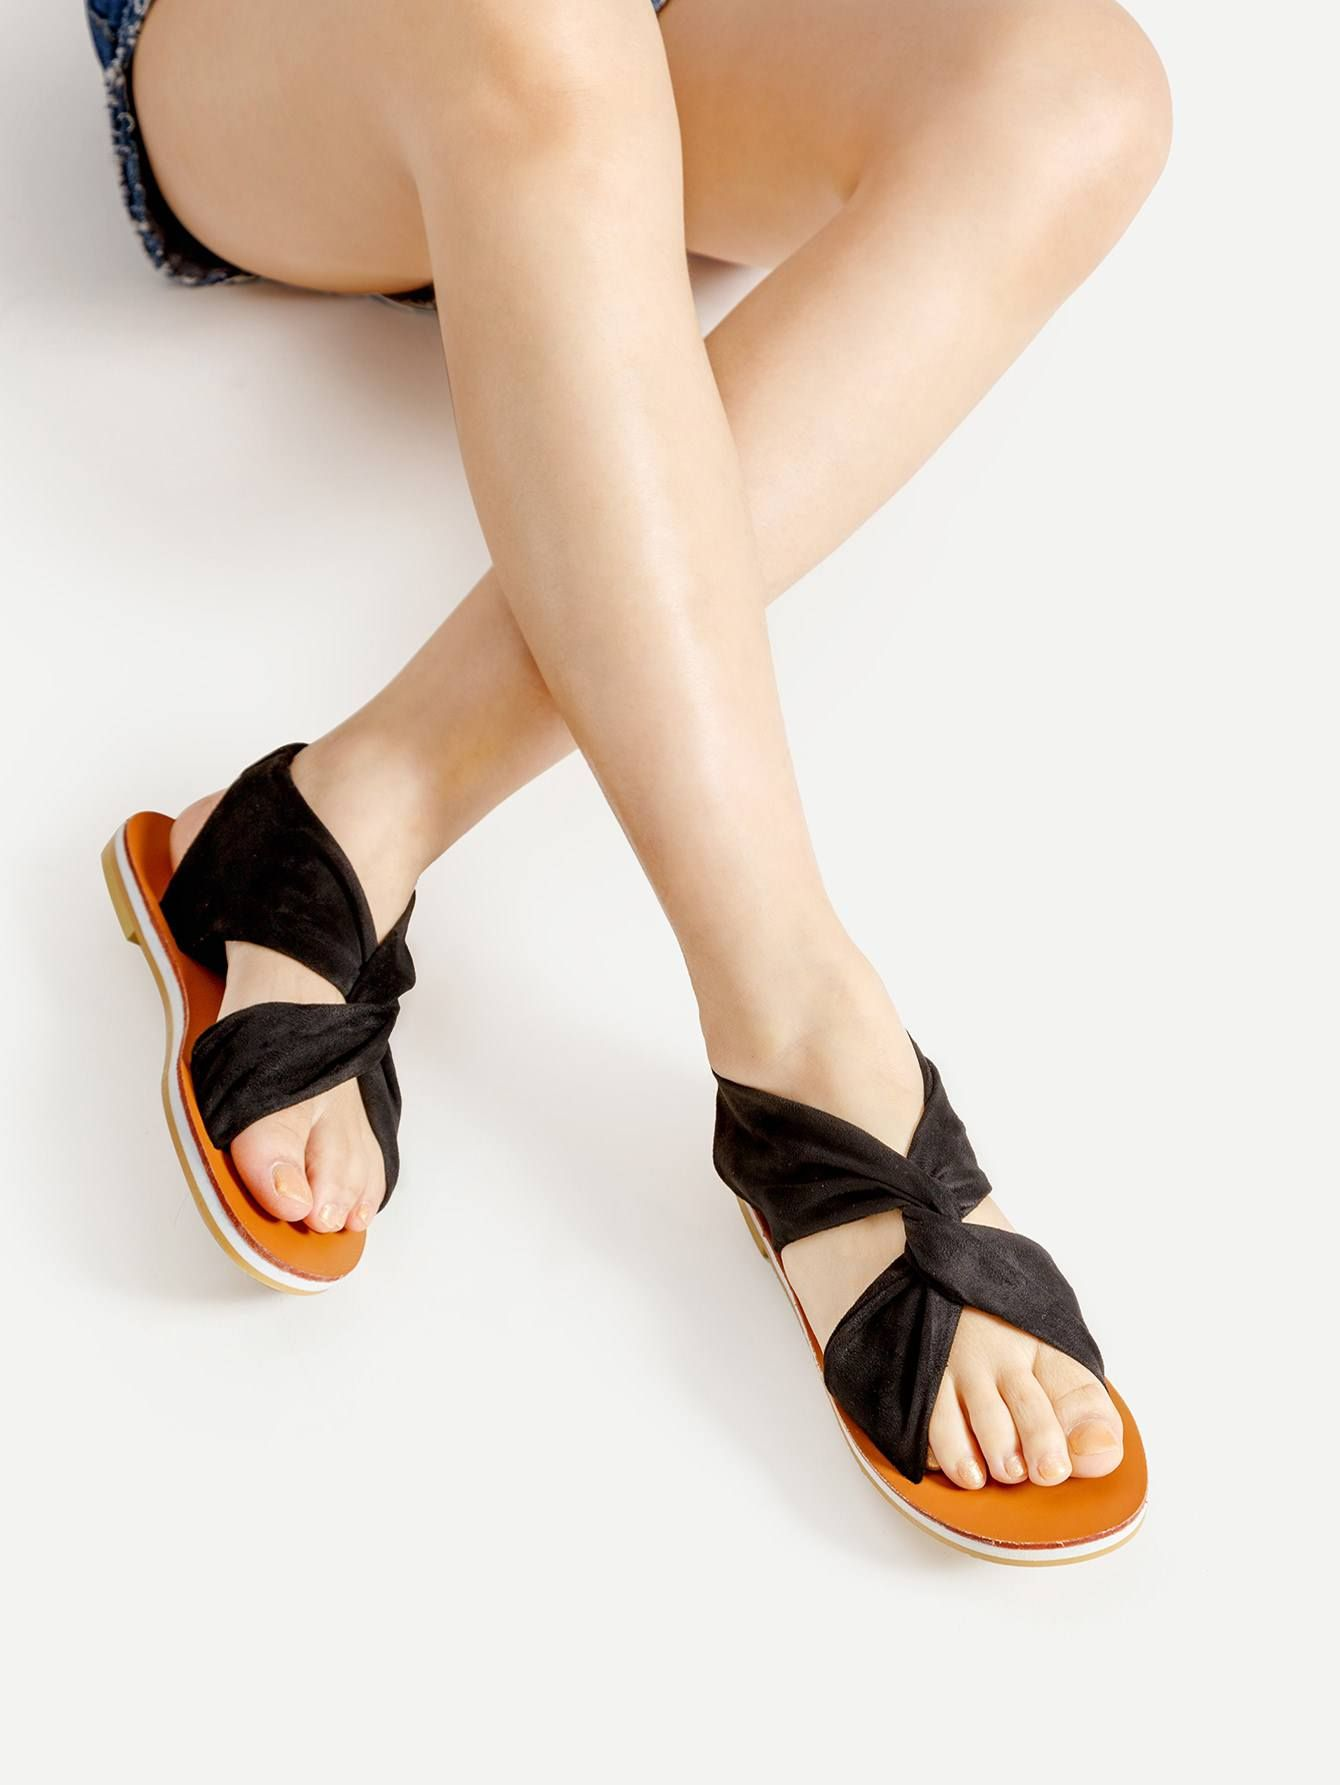 Best 55+ Women s Sandals Ideas To Adorn Your Feet This Summer  Summershoes   sandals  ShoesSandals 56343b3d6d69